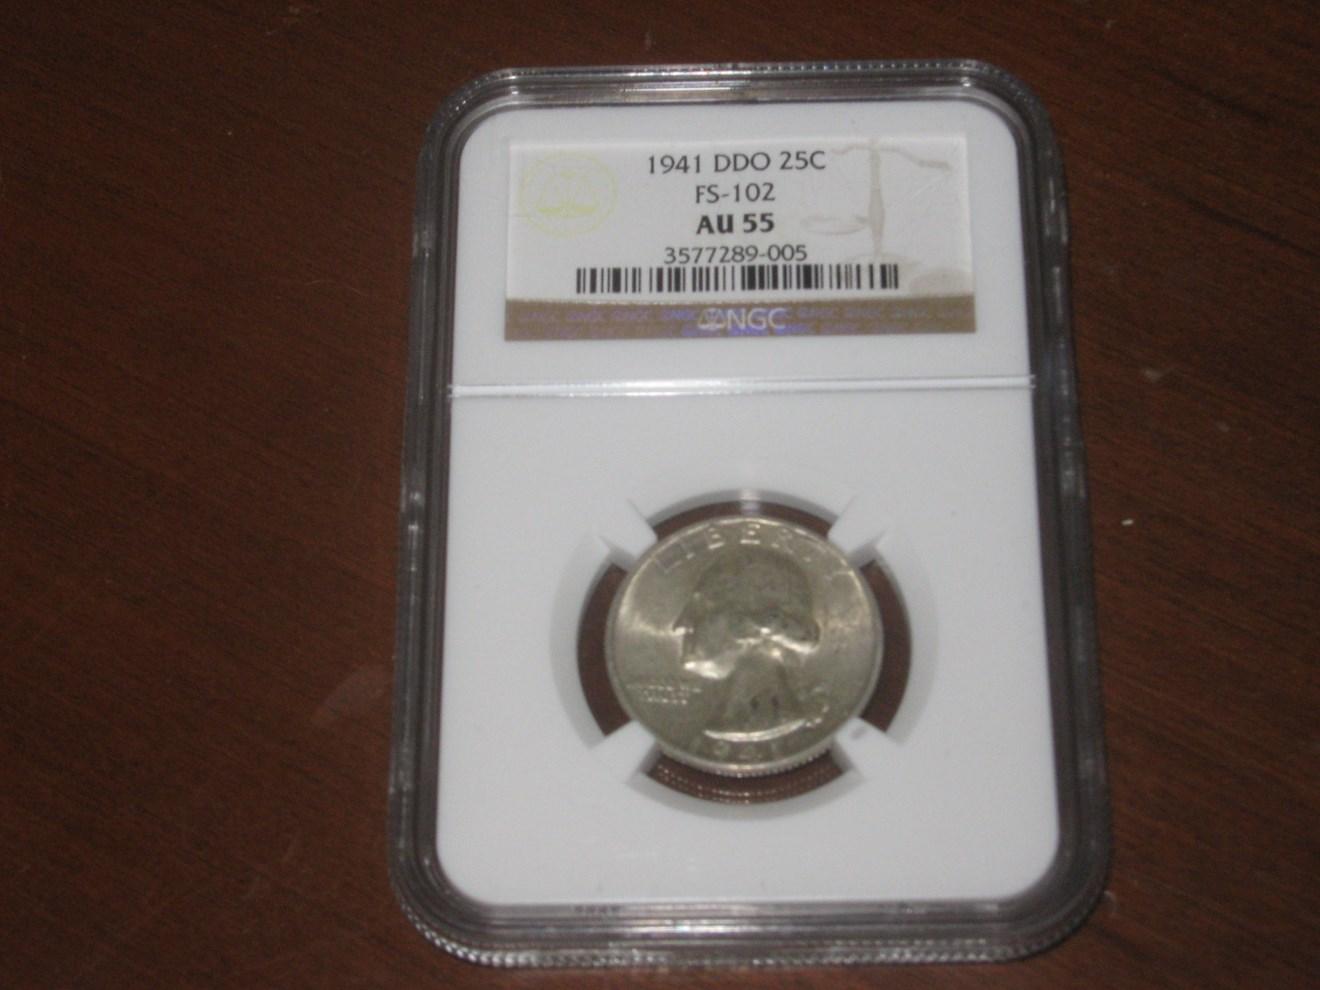 Double Die Obverse FS-102 Coin Details - Quarter Errors & Varieties